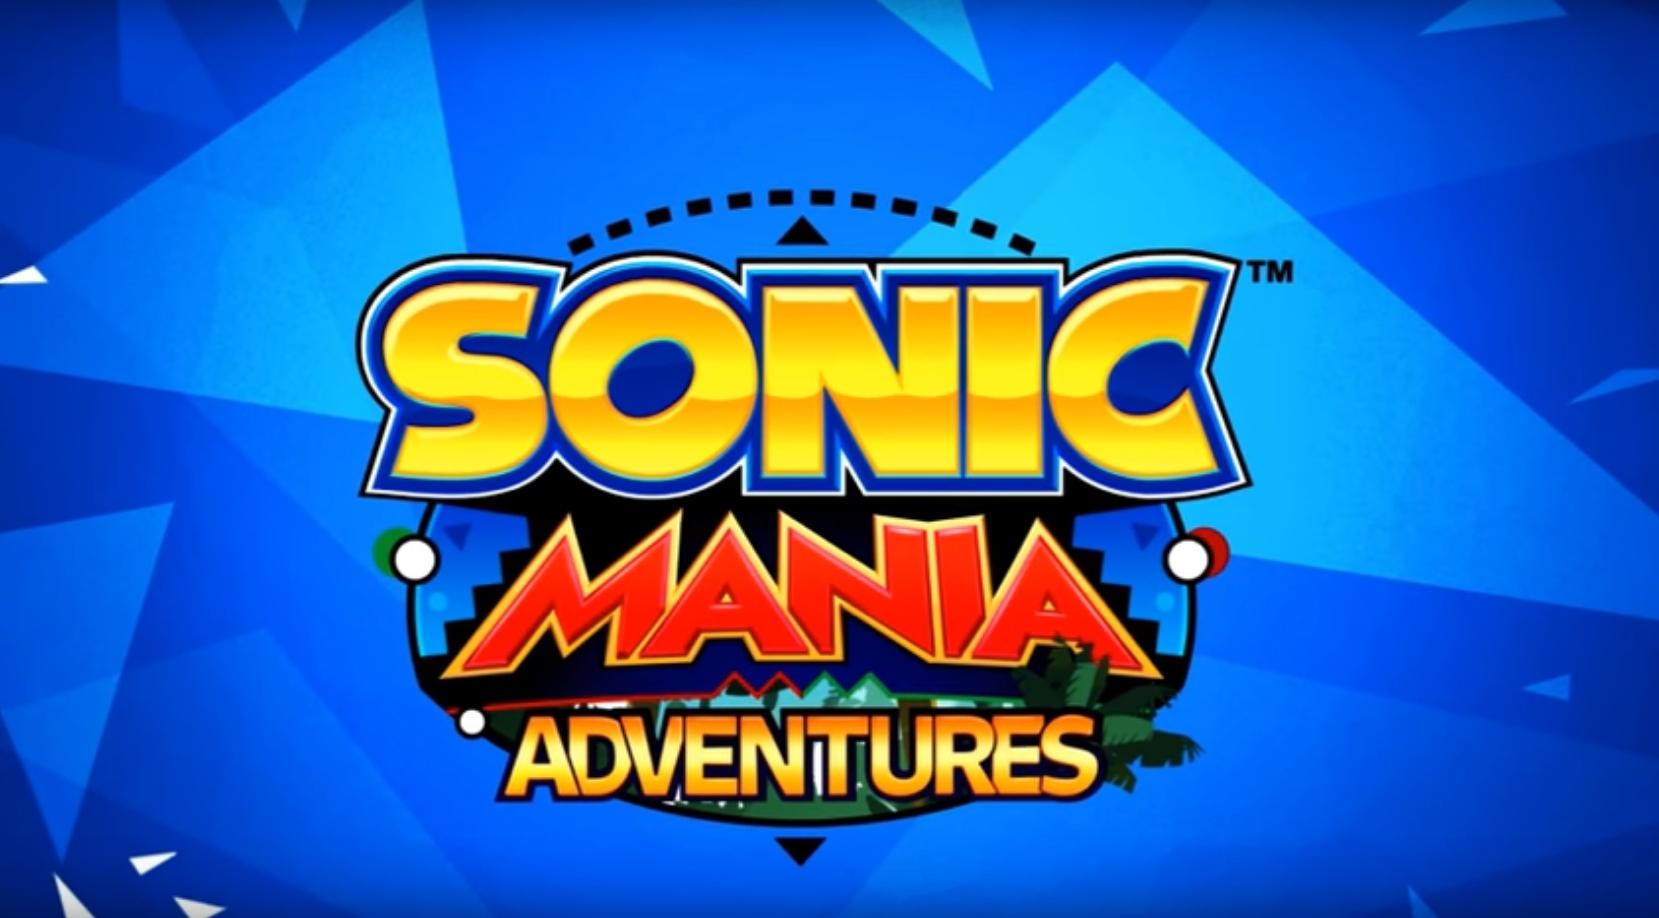 Sonic Mania Adventures 233 A Pr 243 Xima S 233 Rie Animada De Sonic